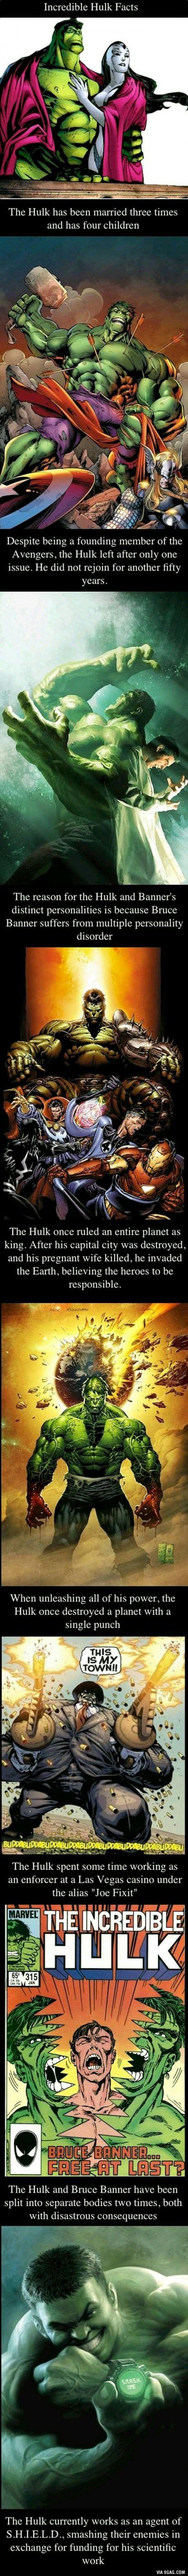 Hulk facts.